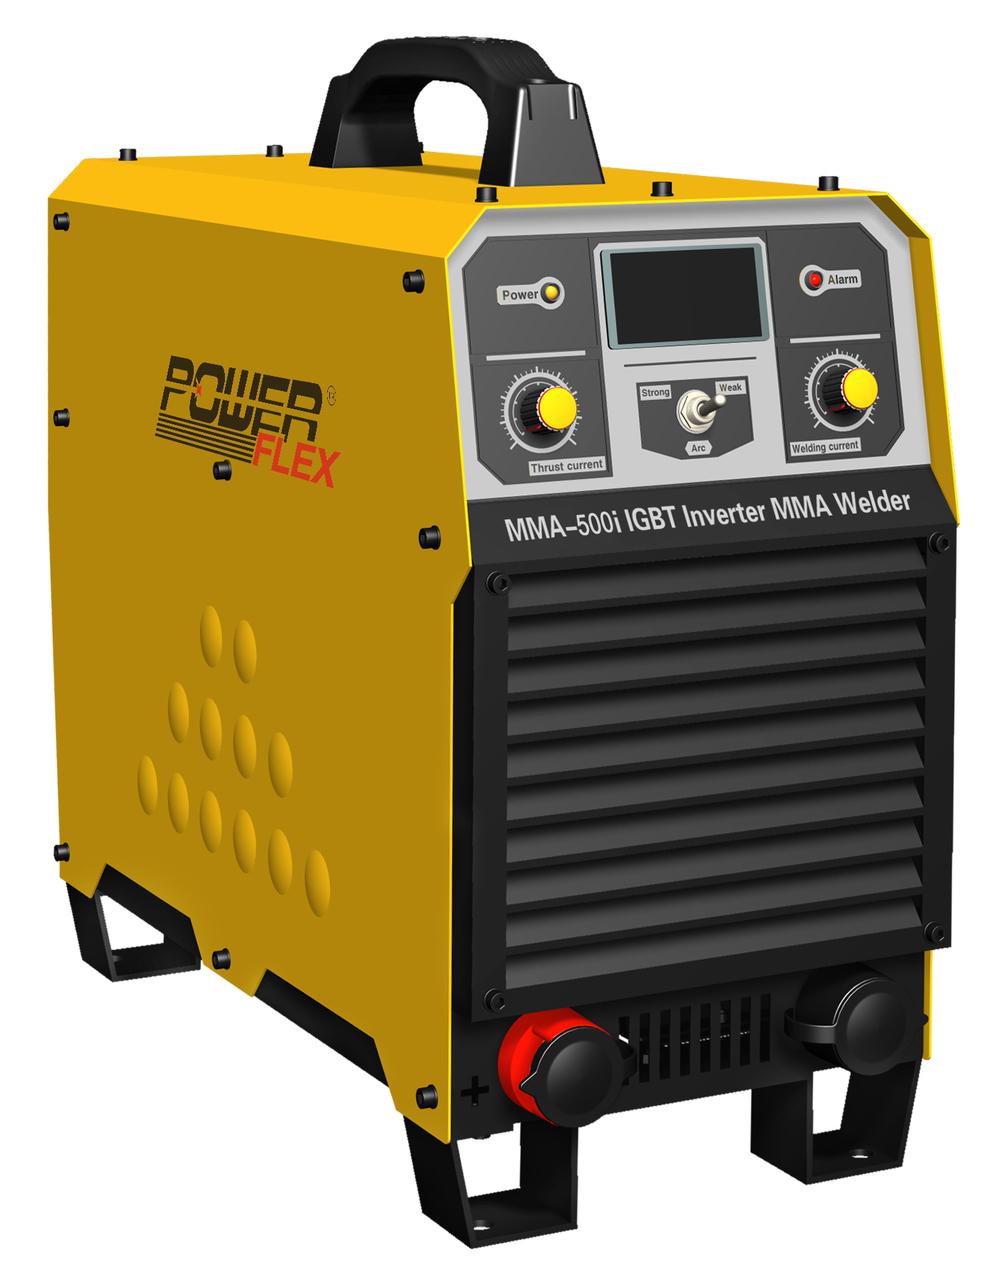 powerflex welding machine mma-500i 3 phase-electric-powered